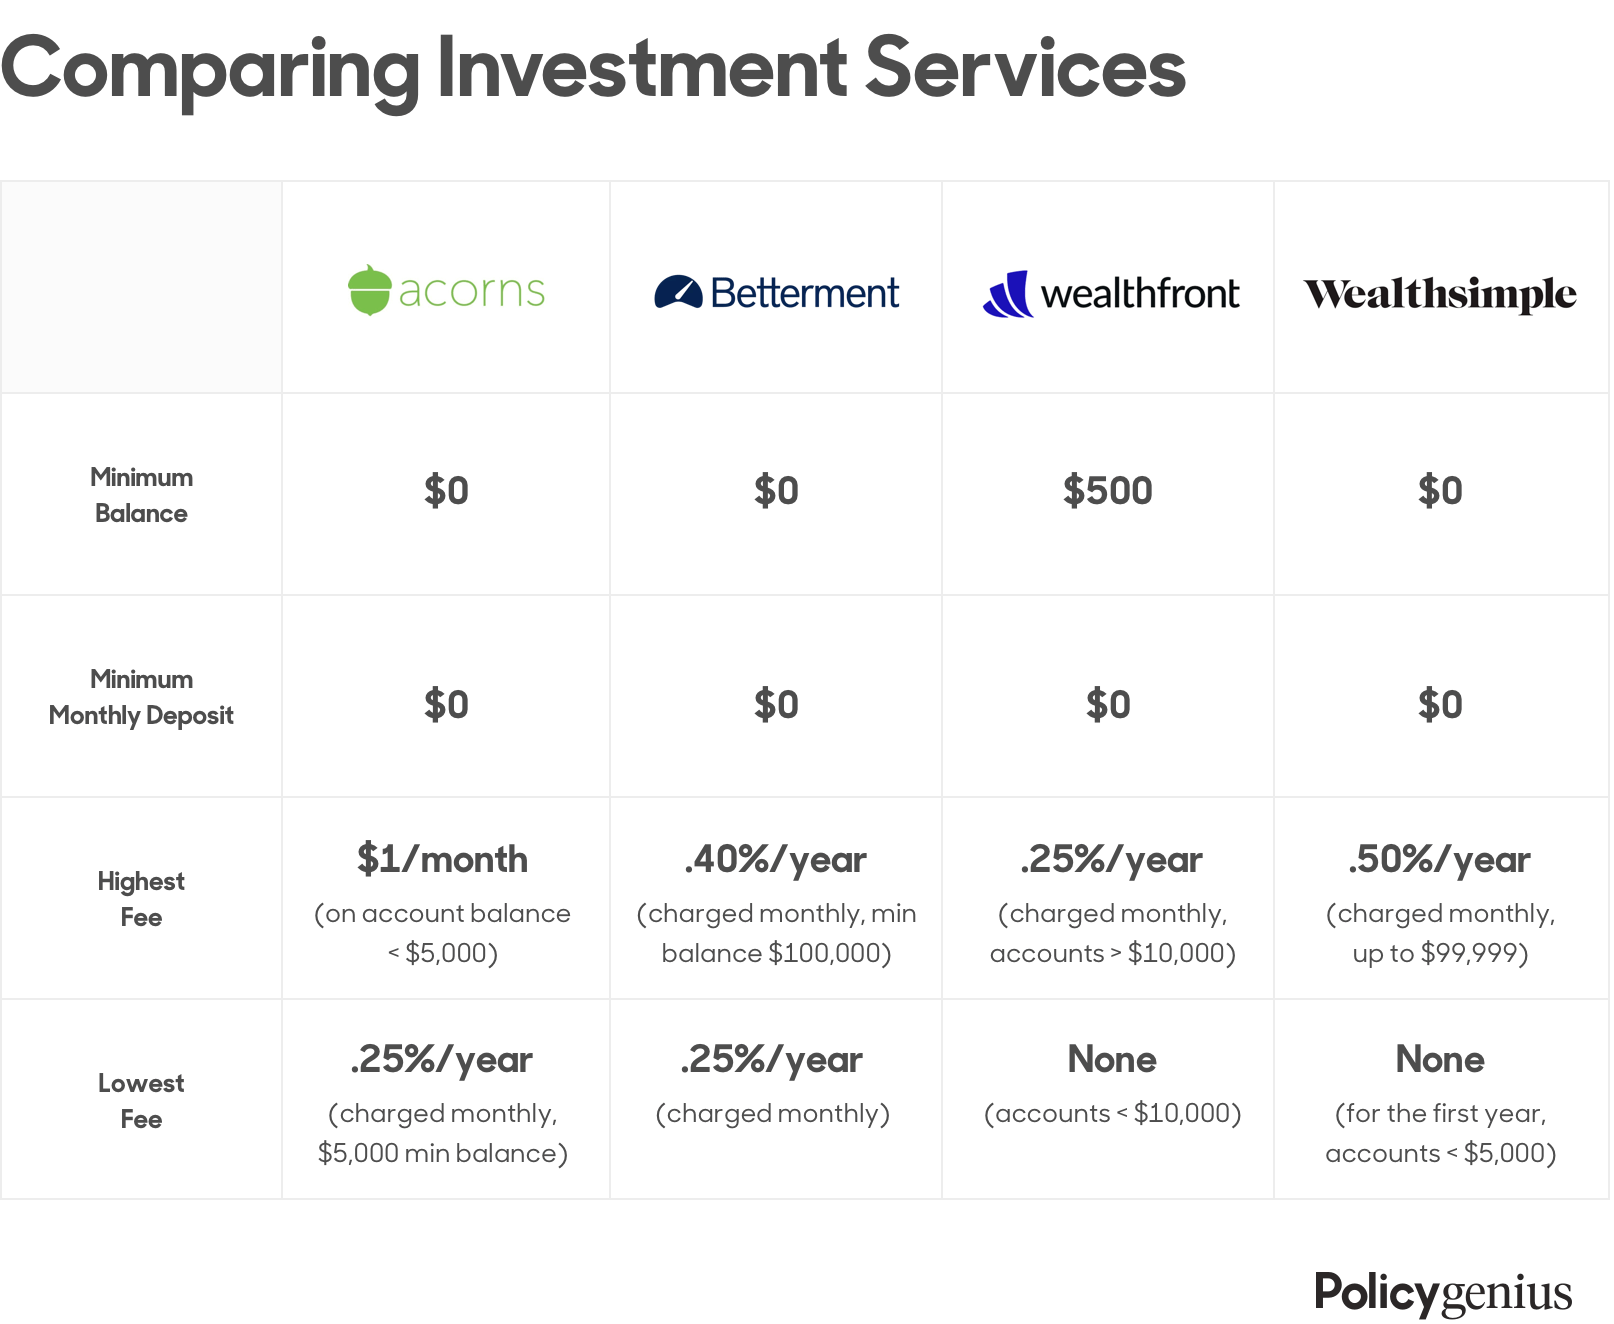 Comparing Investment